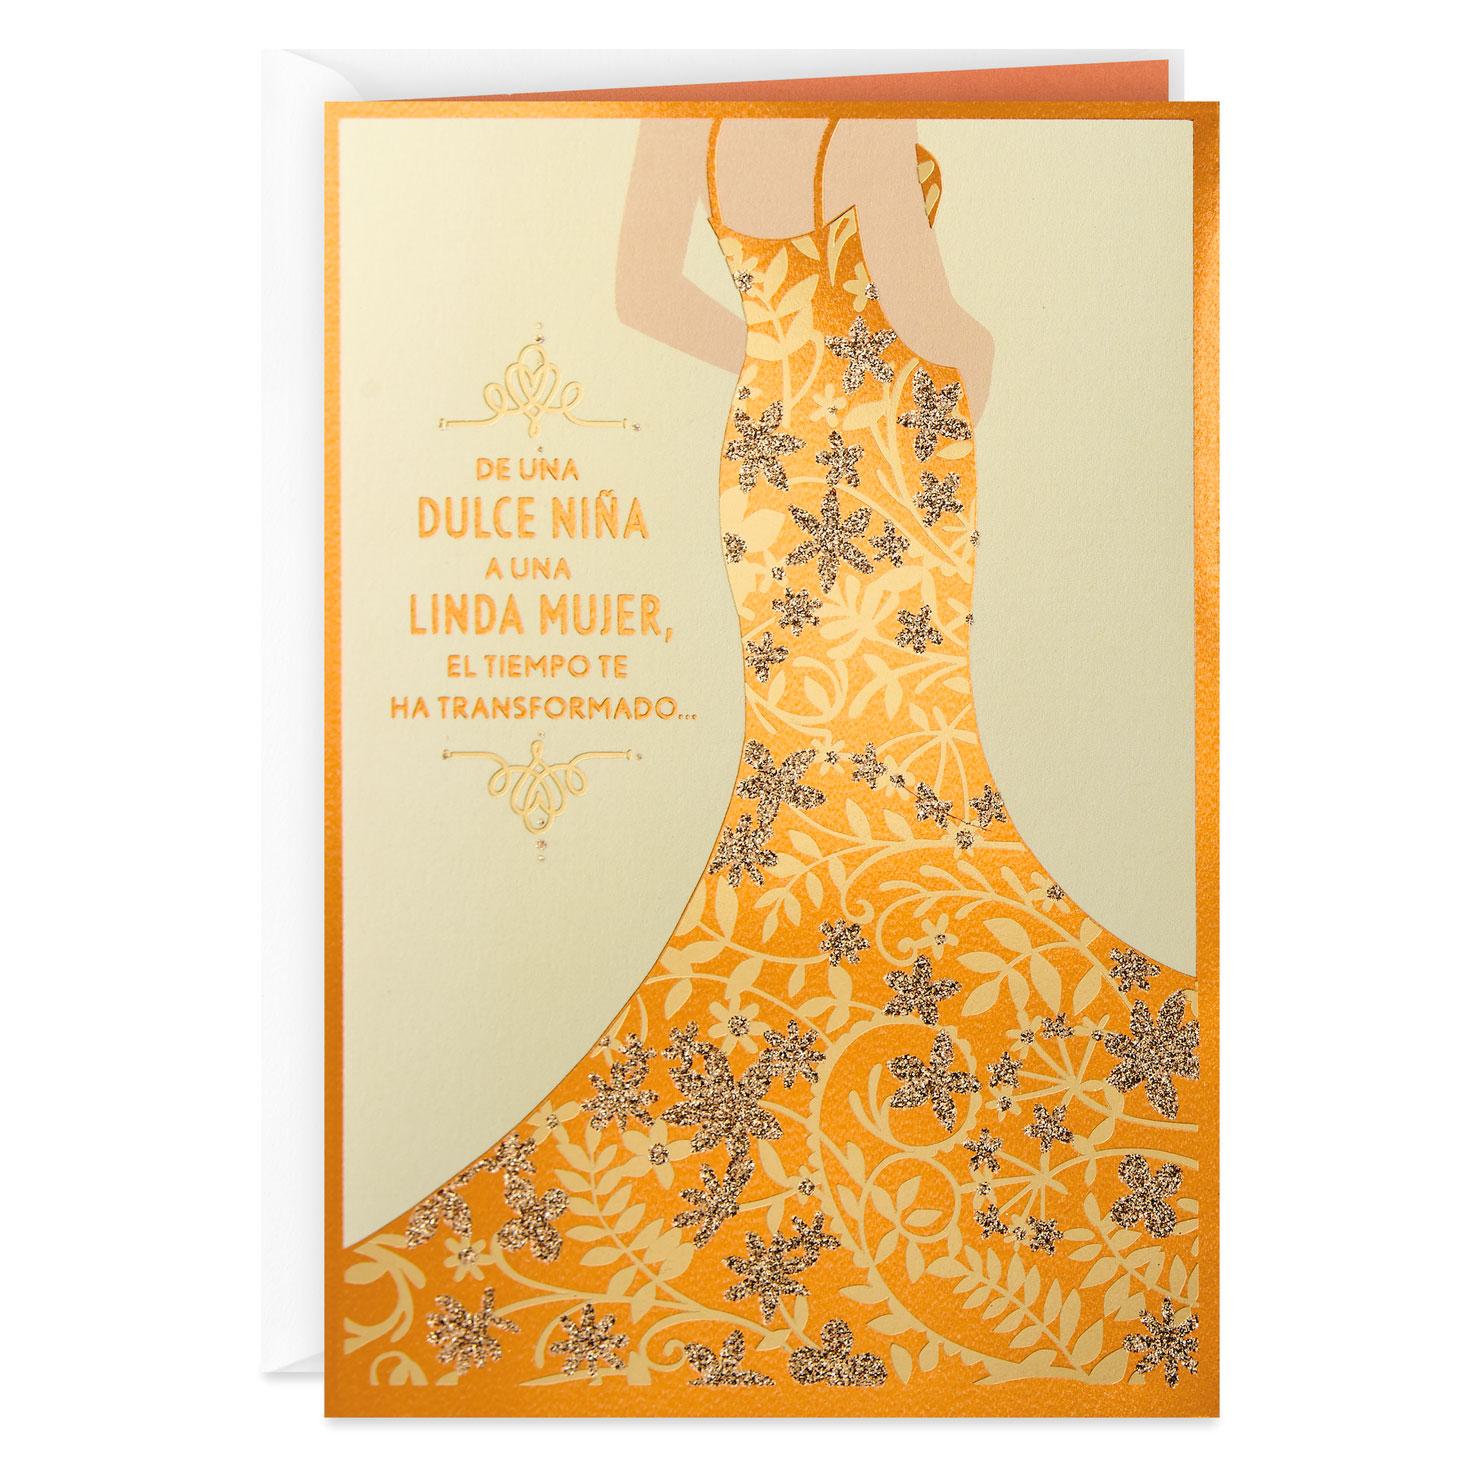 a beautiful young woman spanishlanguage quinceañera card